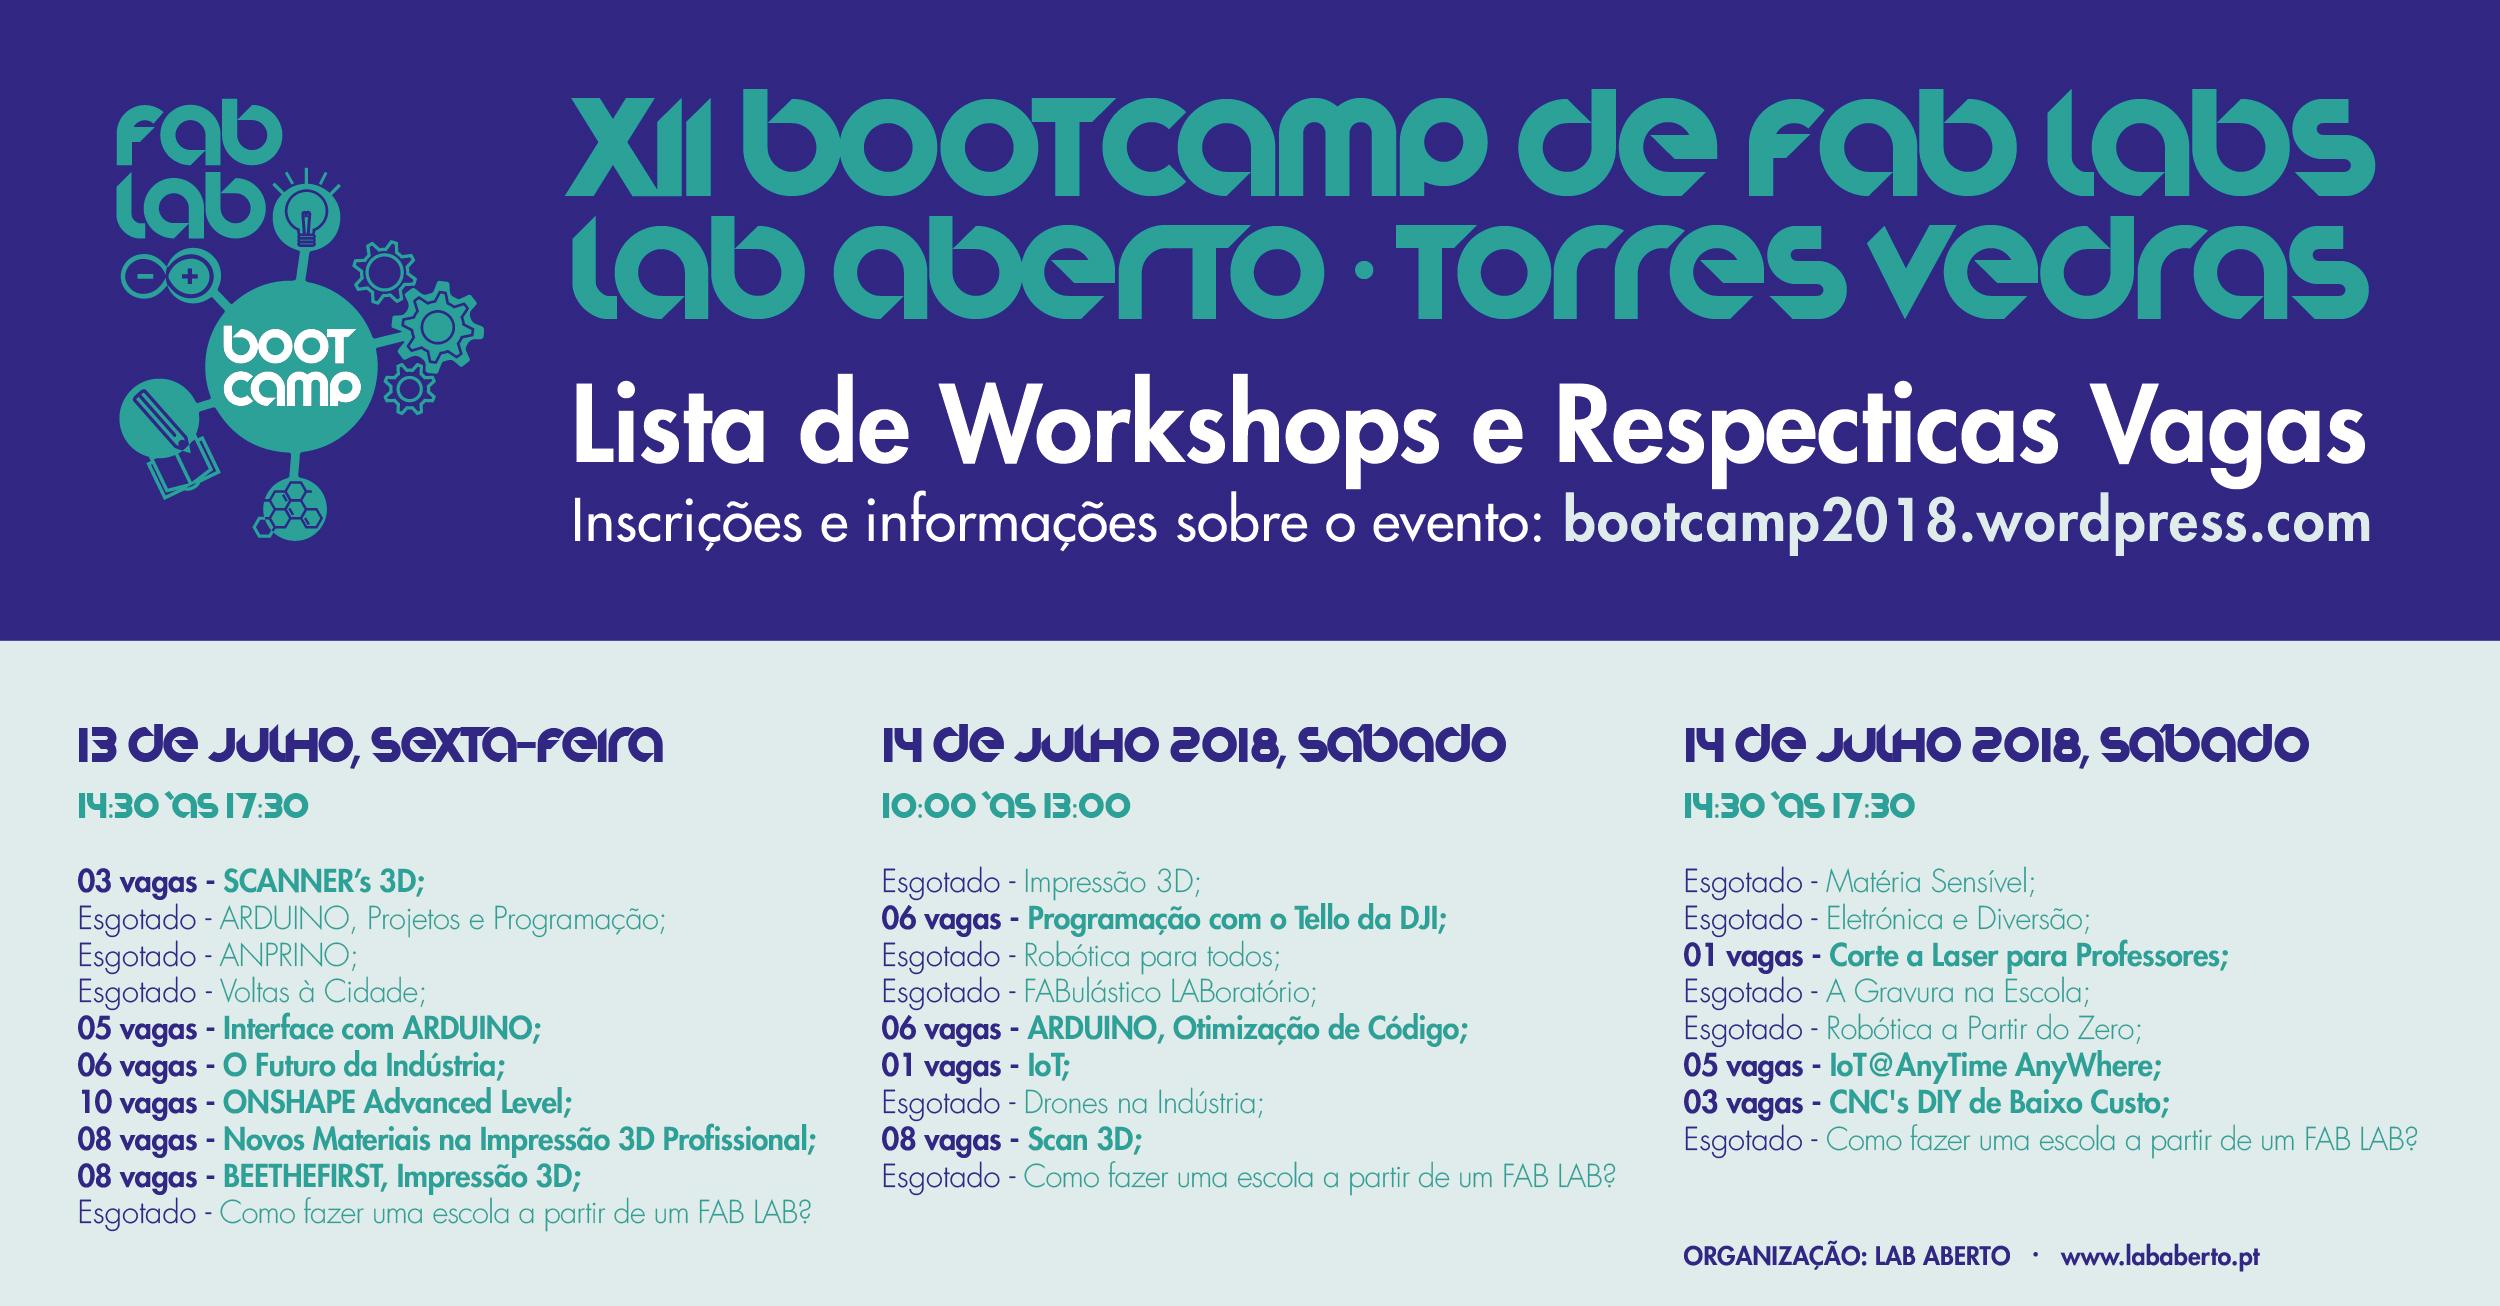 Vagas disponíveis nos Workshops Fablab Bootcamp